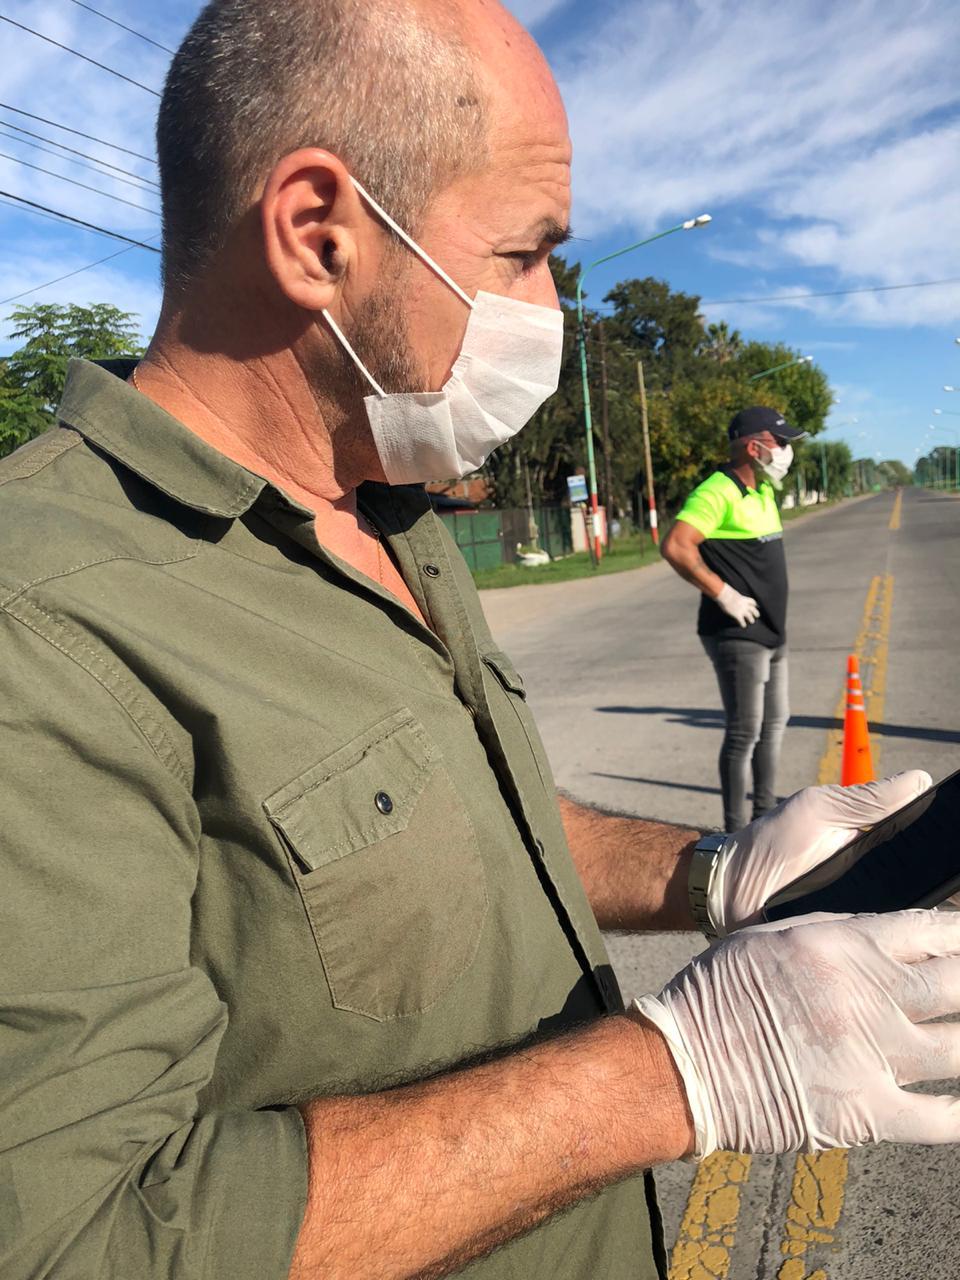 Se estudia un posible caso de coronavirus en Ensenada